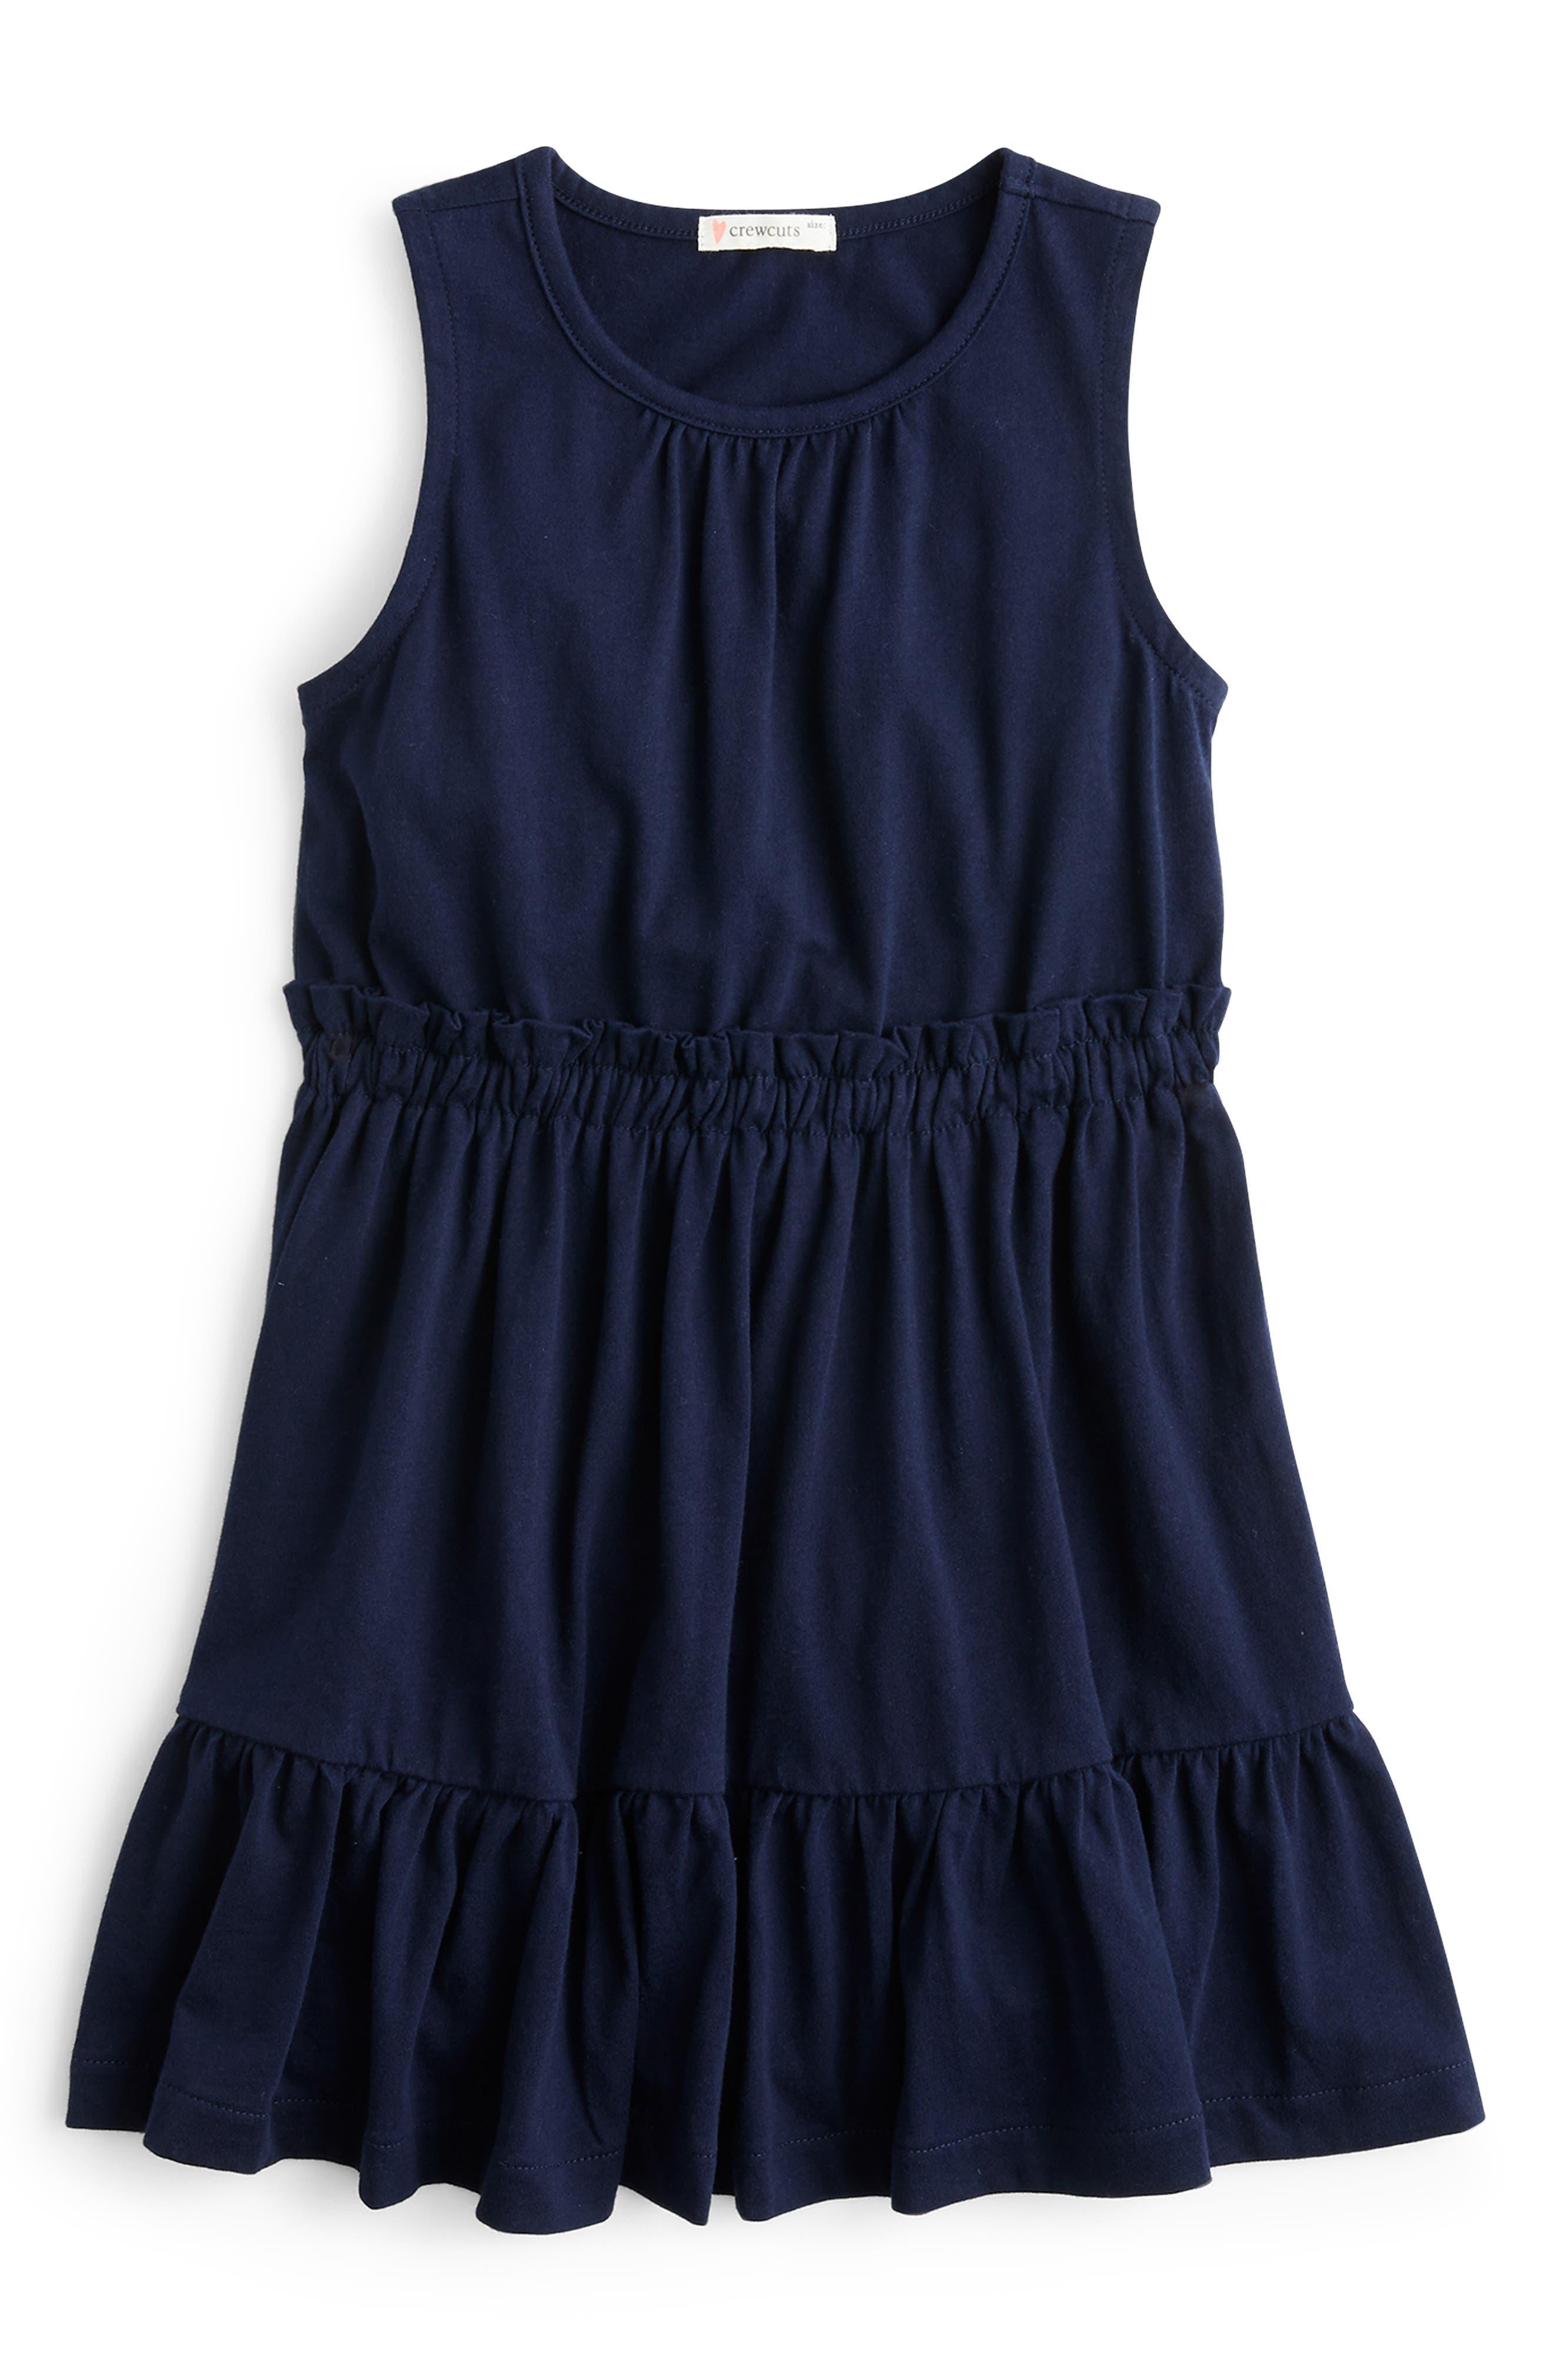 Toddler Girls Crewcuts By Jcrew Sleeveless Ruffle Dress Size 2T  Blue